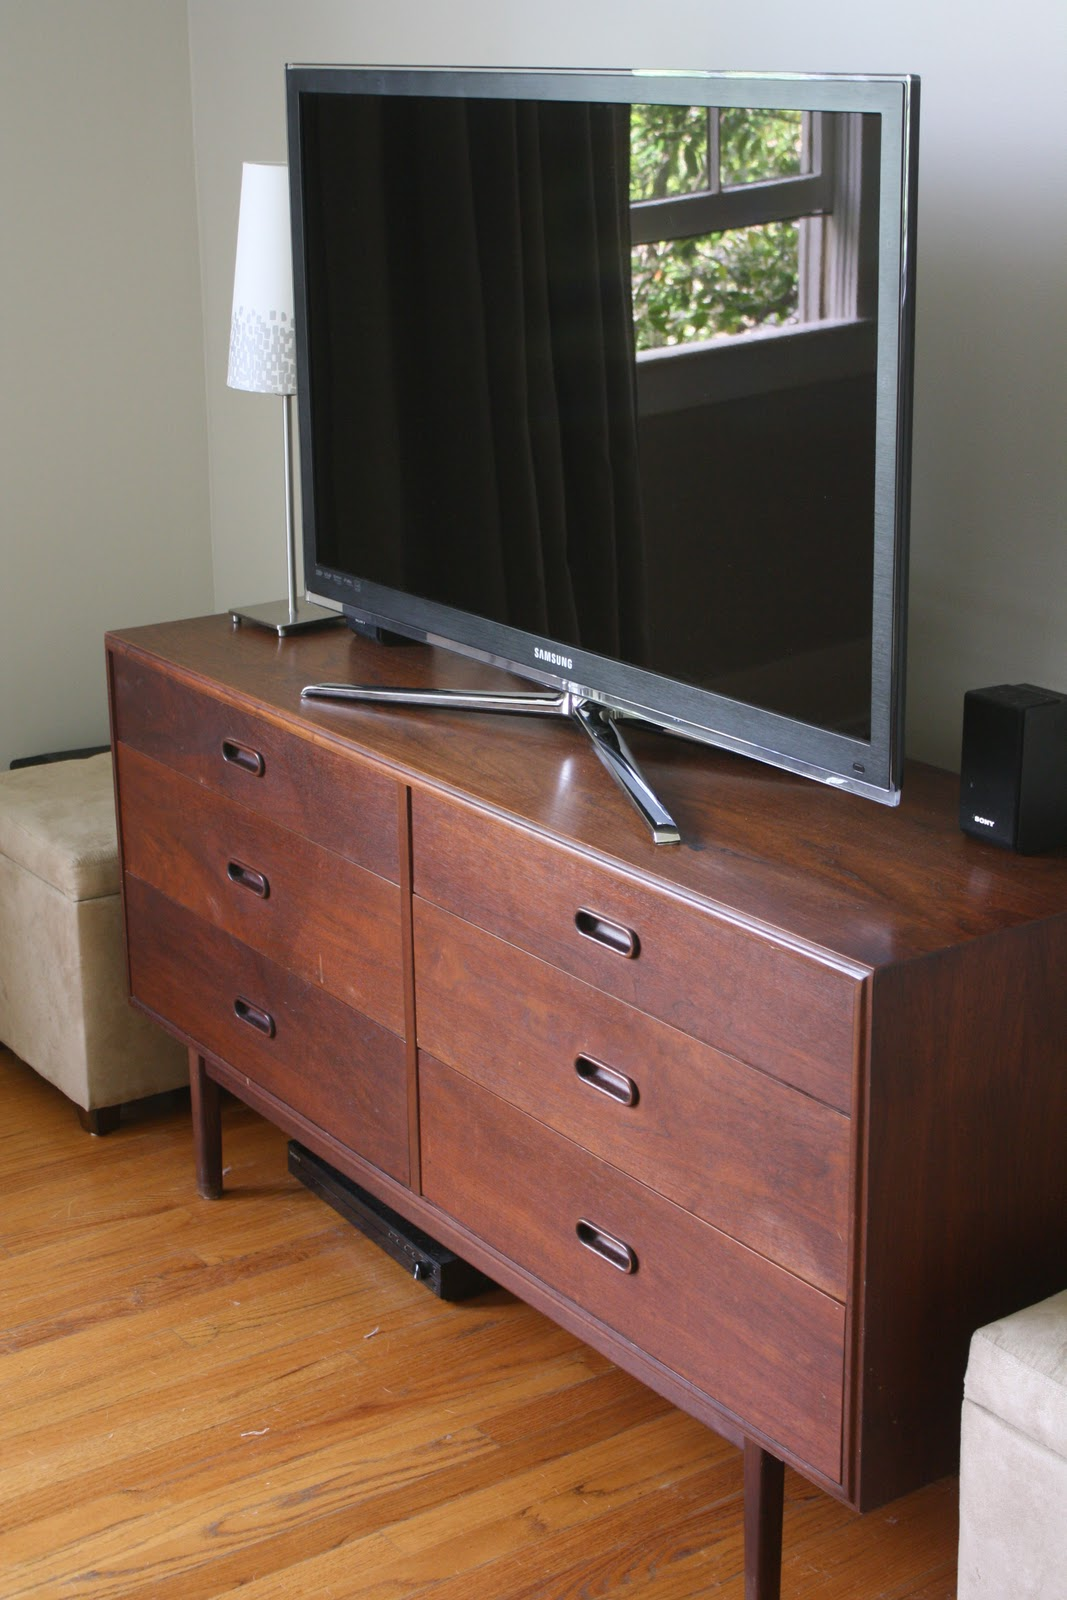 dwell and tell: Living Room Progress - Dresser for TV